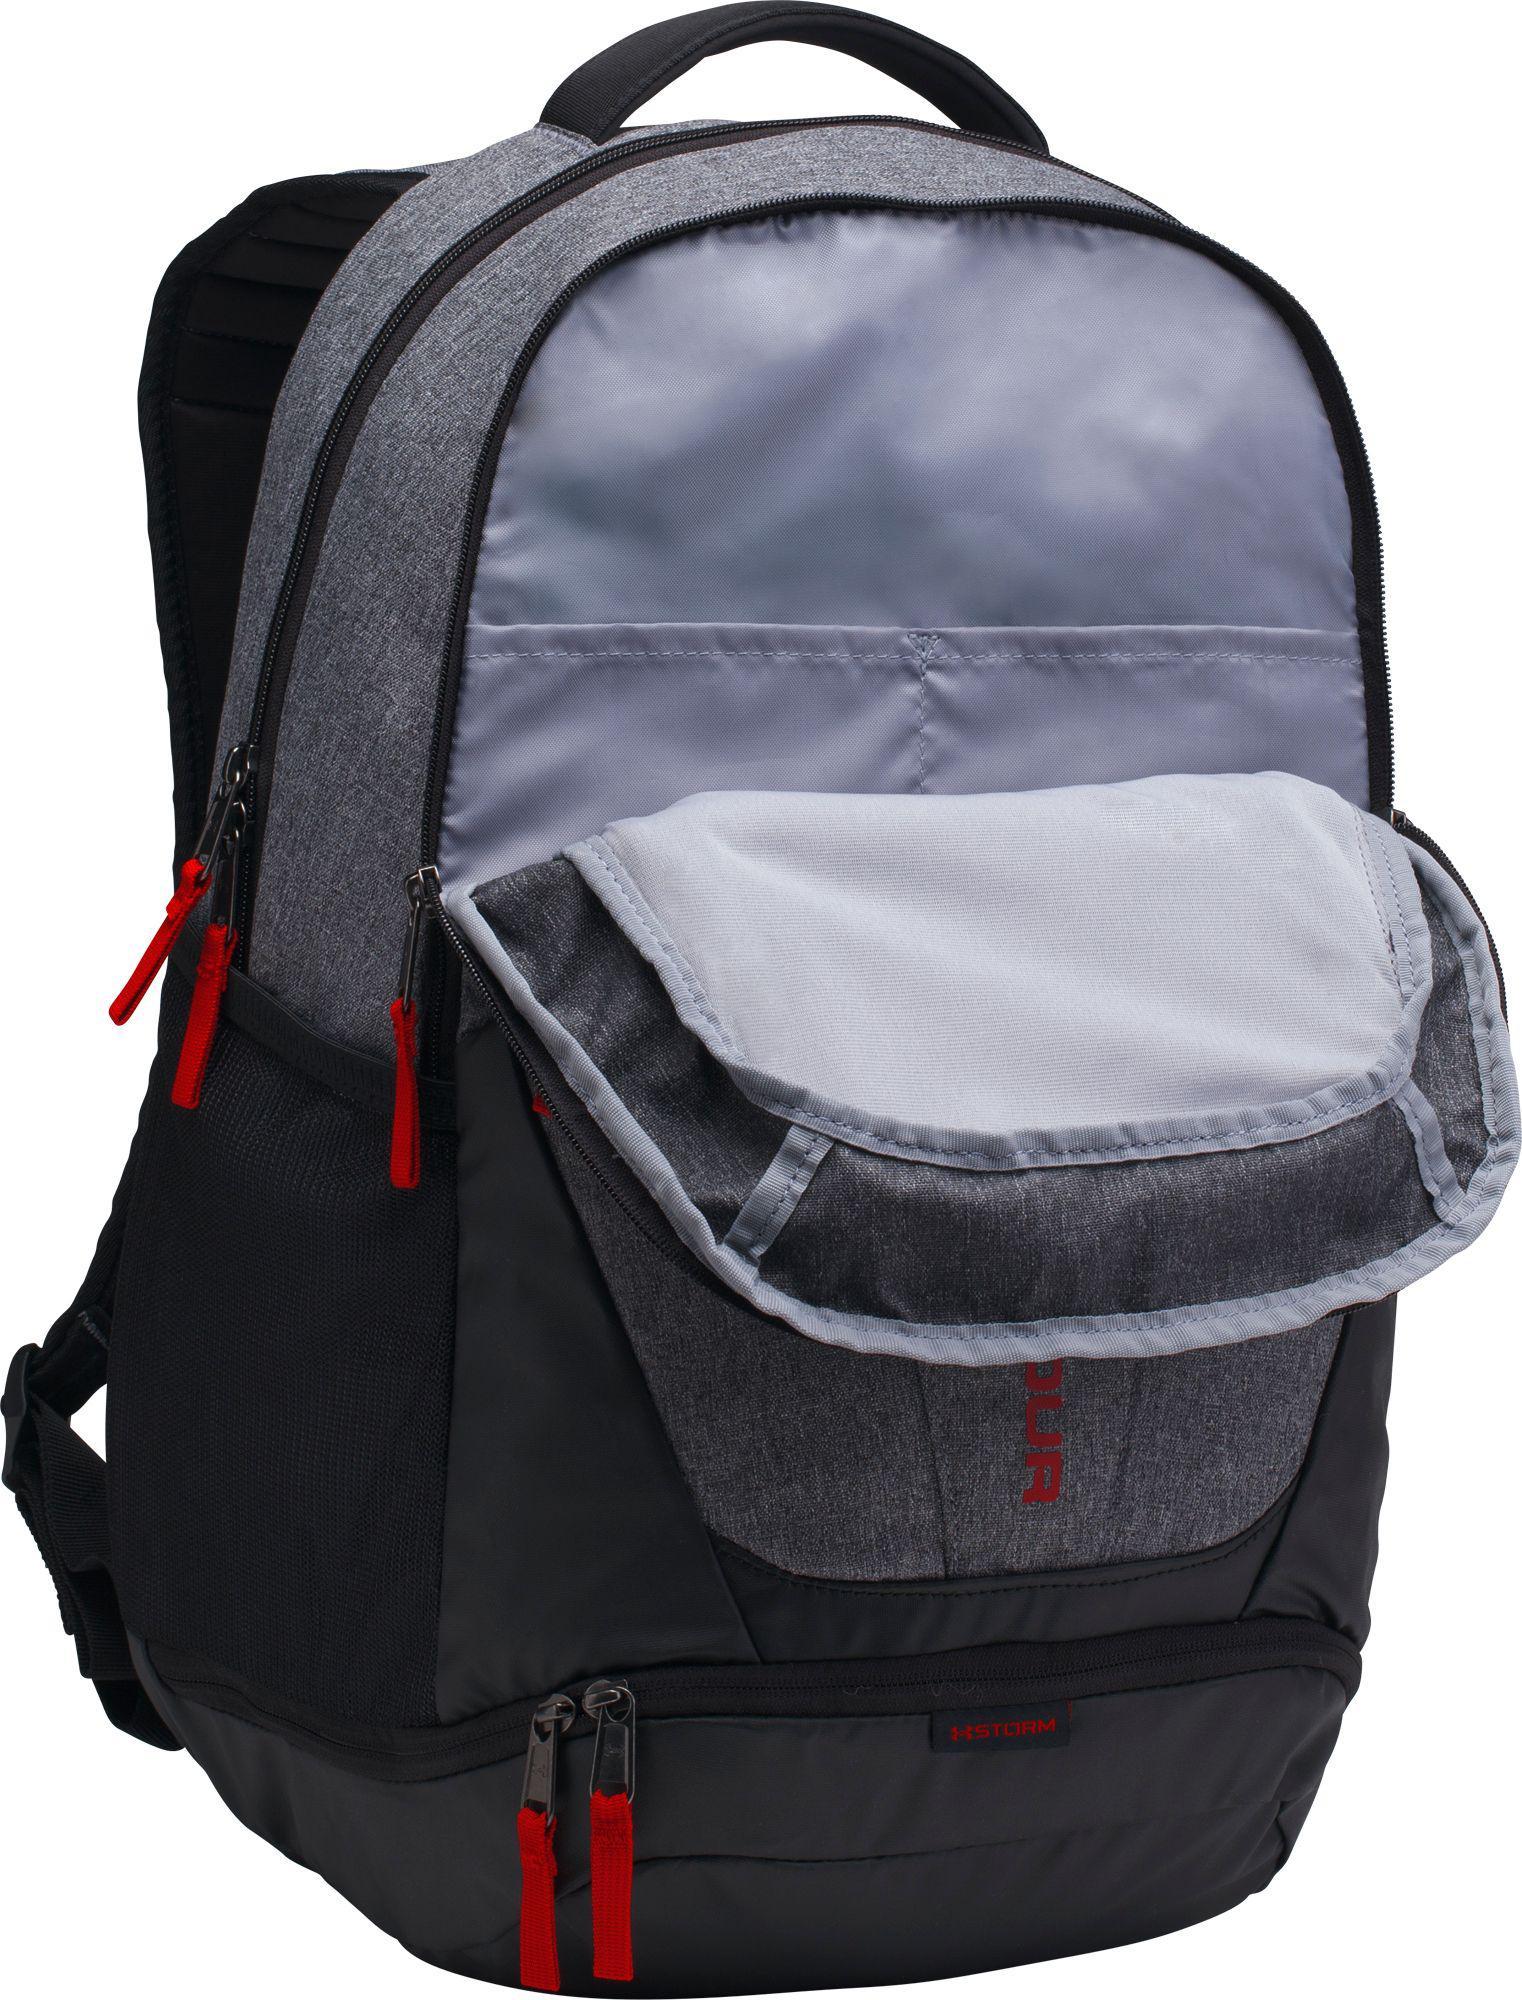 a997debd051e Lyst - Under Armour Hustle 3.0 Backpack in Black for Men